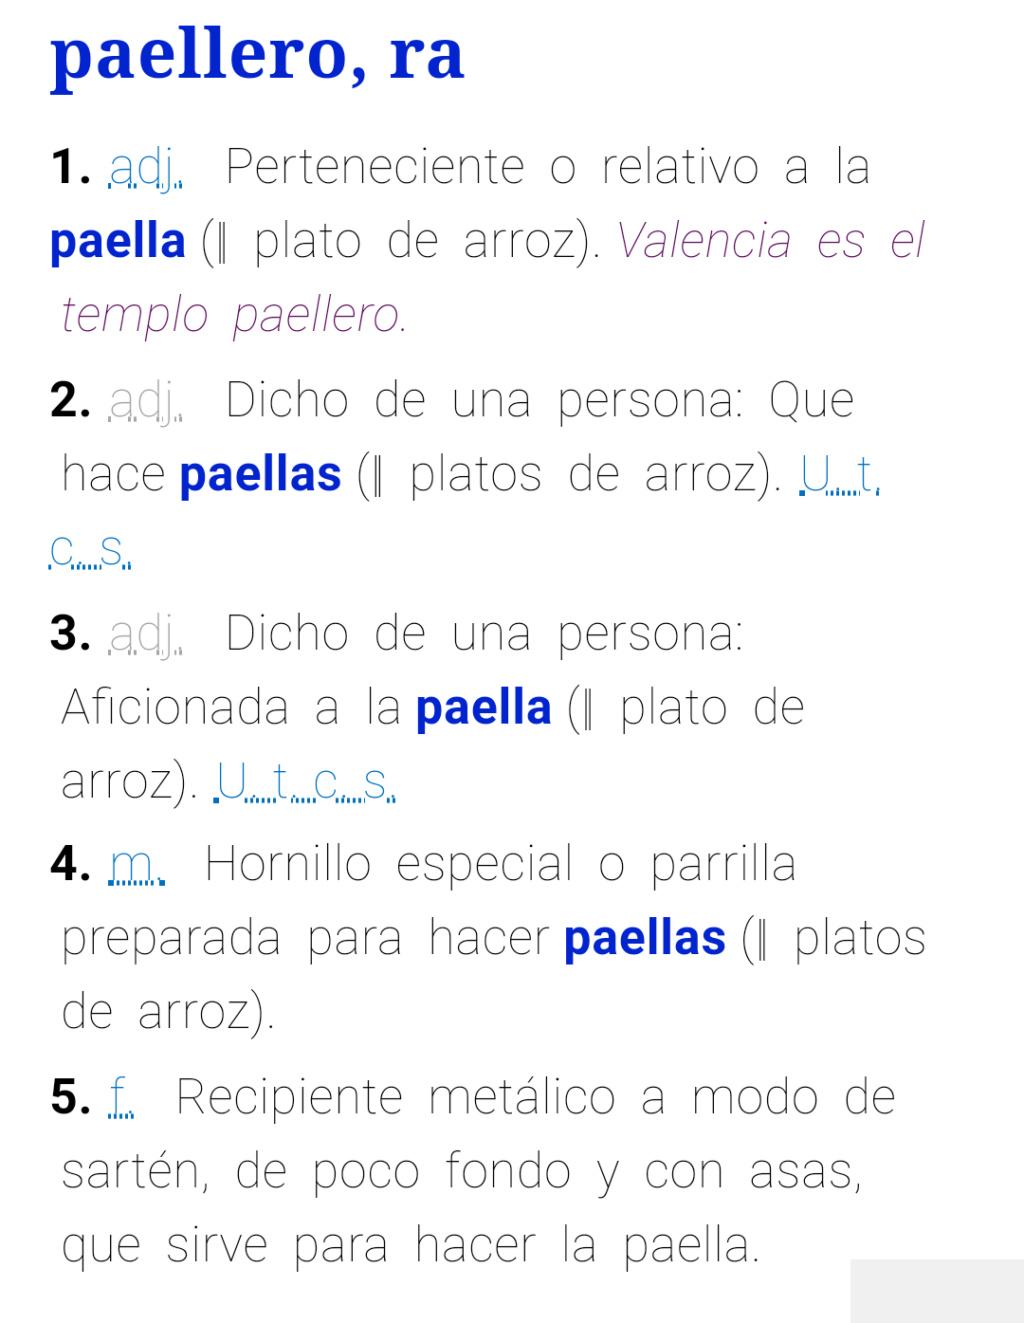 El maravilloso topic bastardo de la Paella - Página 2 Screen18